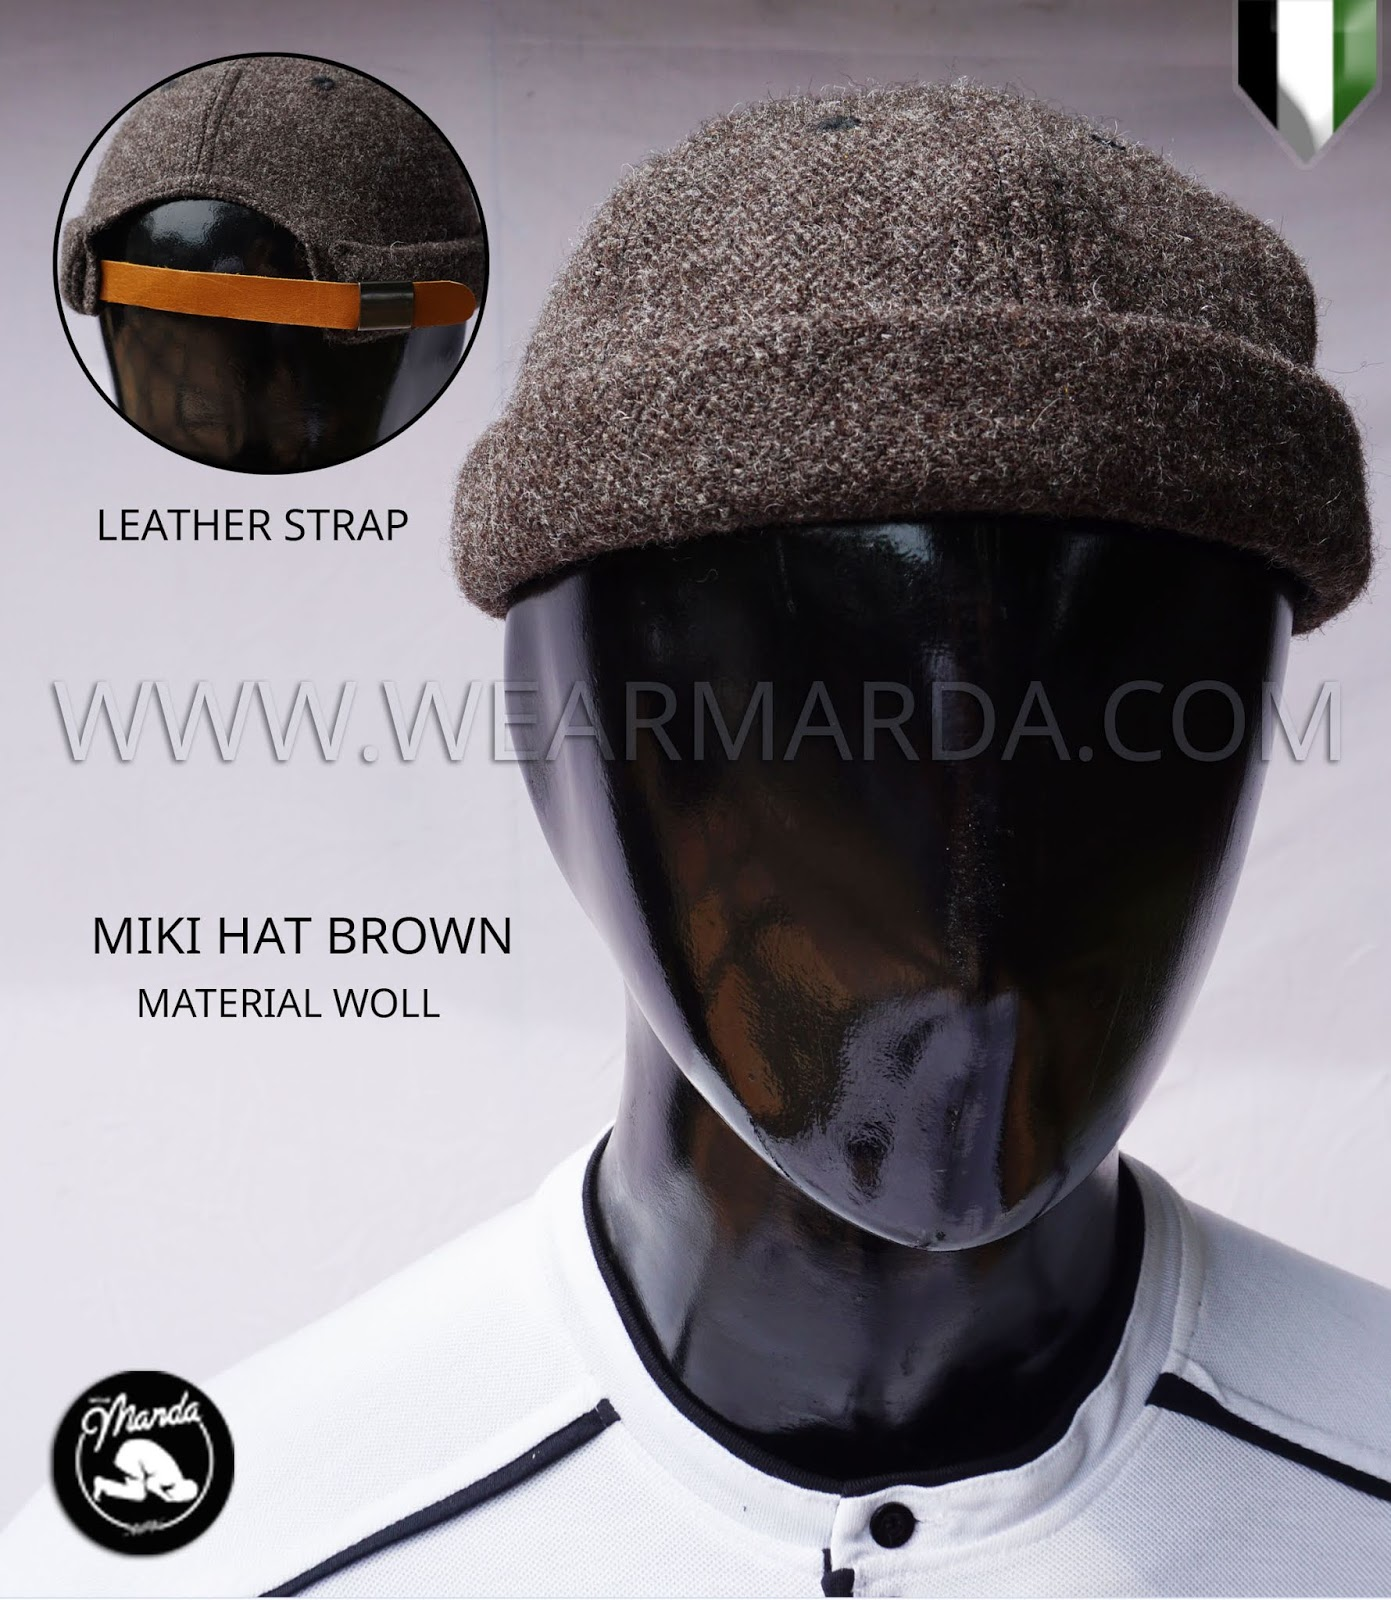 MIKI HAT BROWN